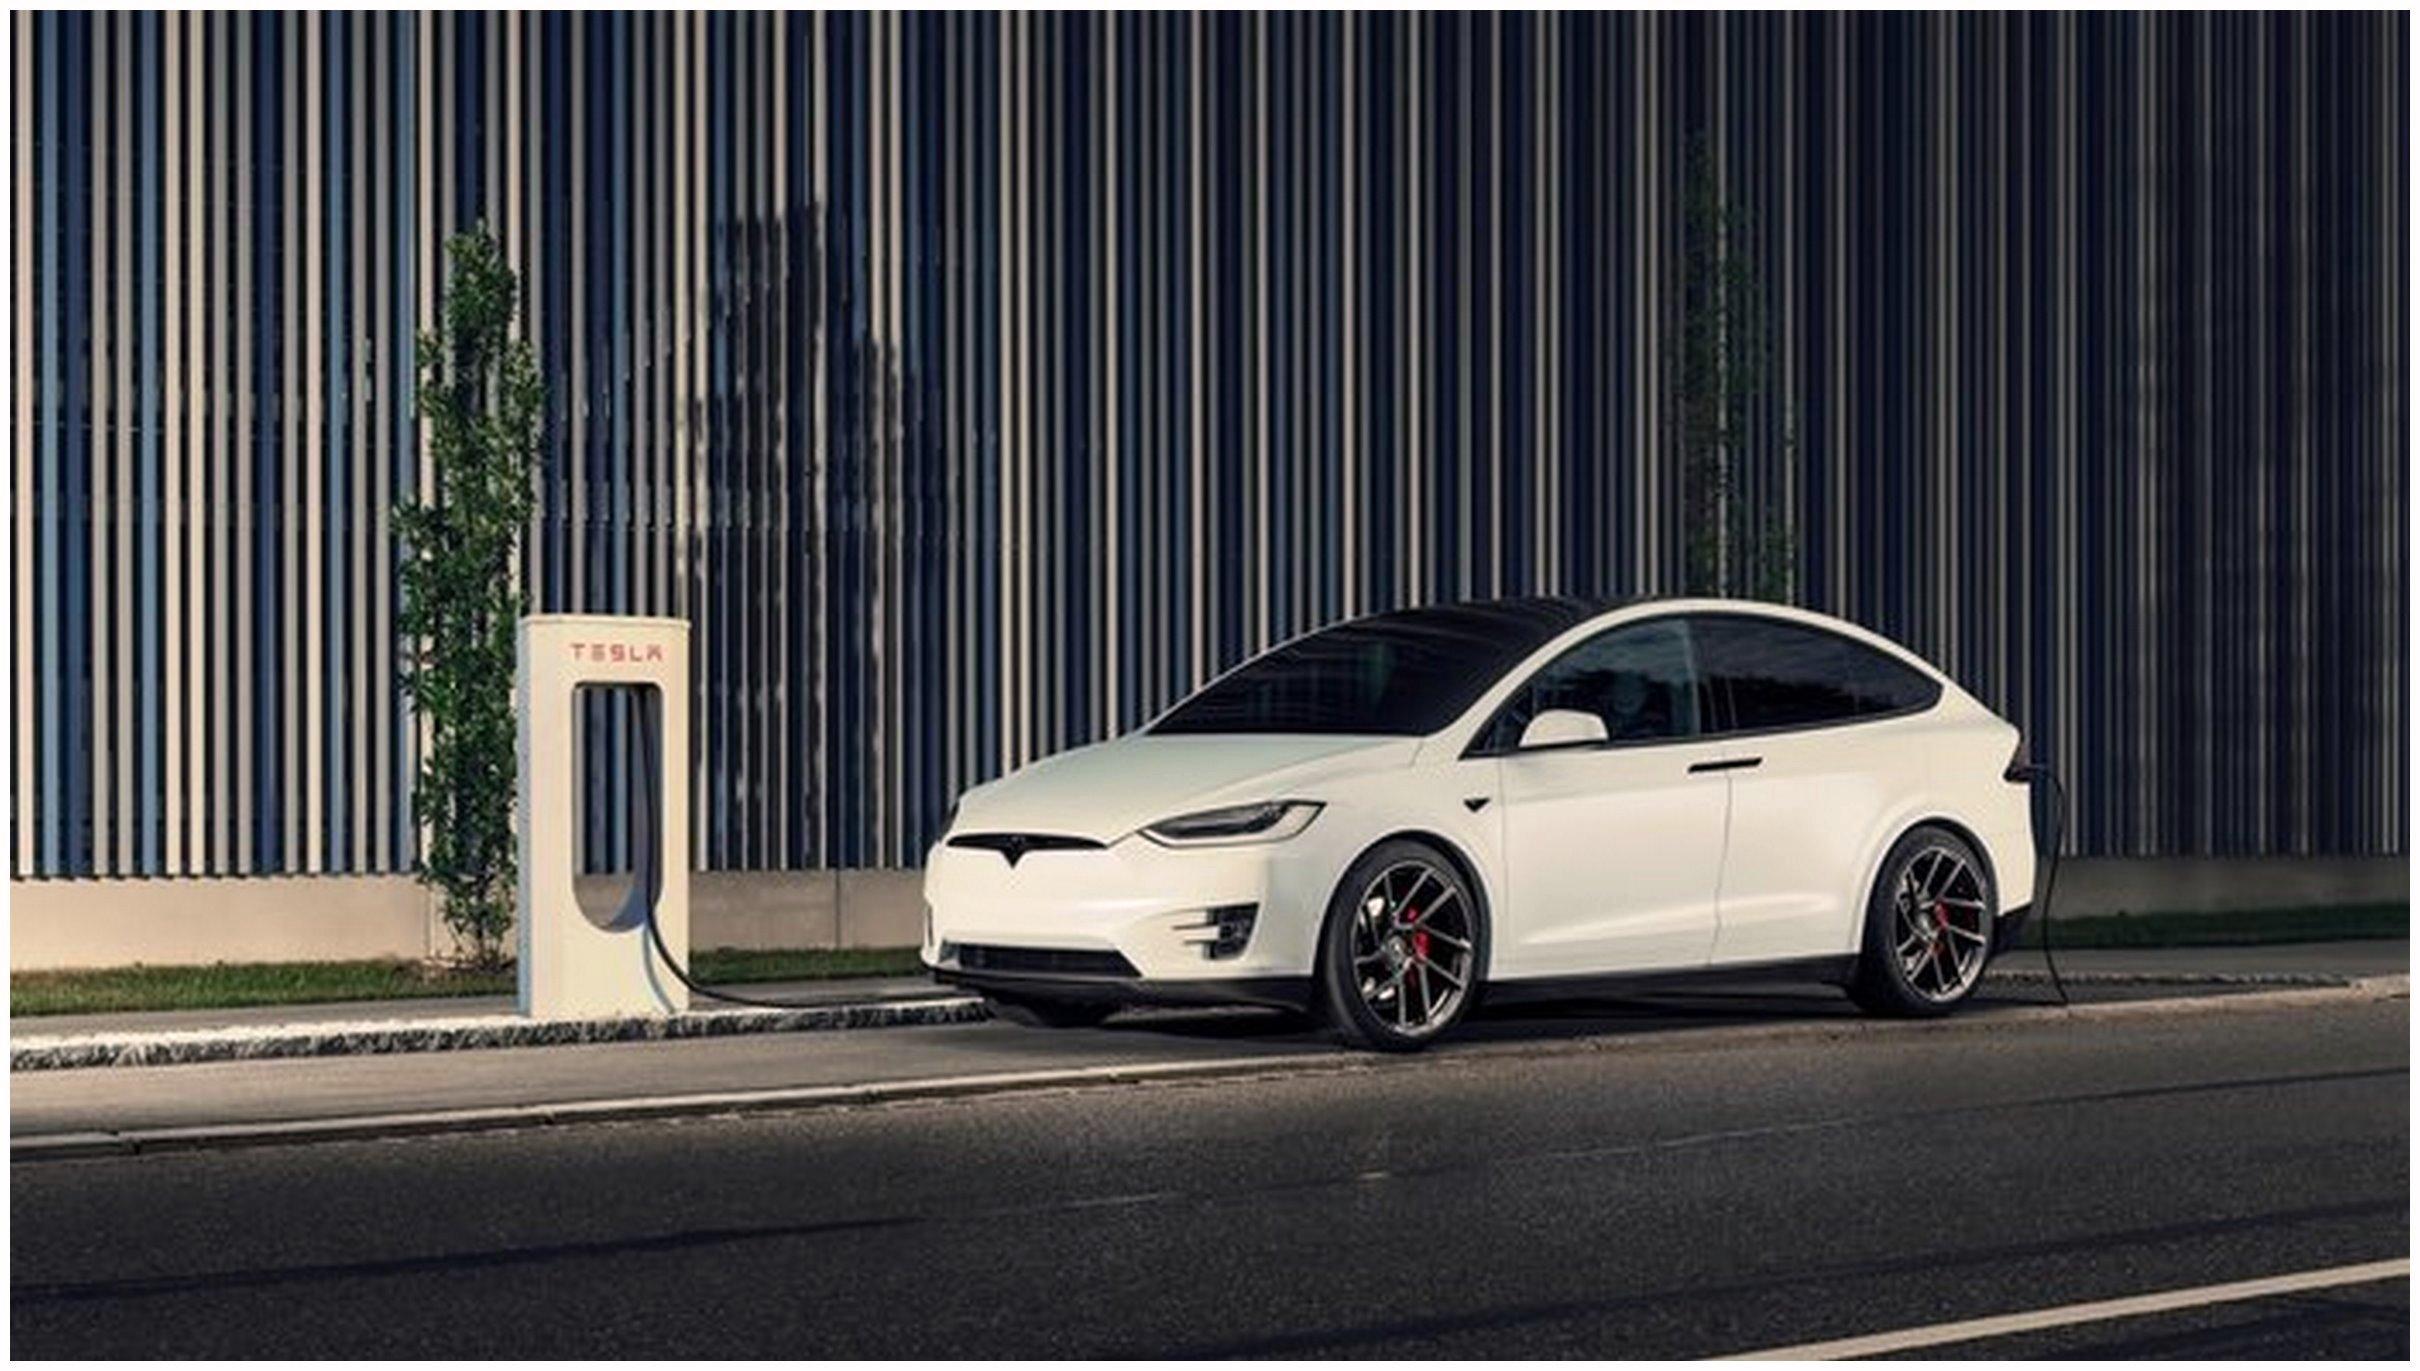 X model Tesla Wallpapers free White Car